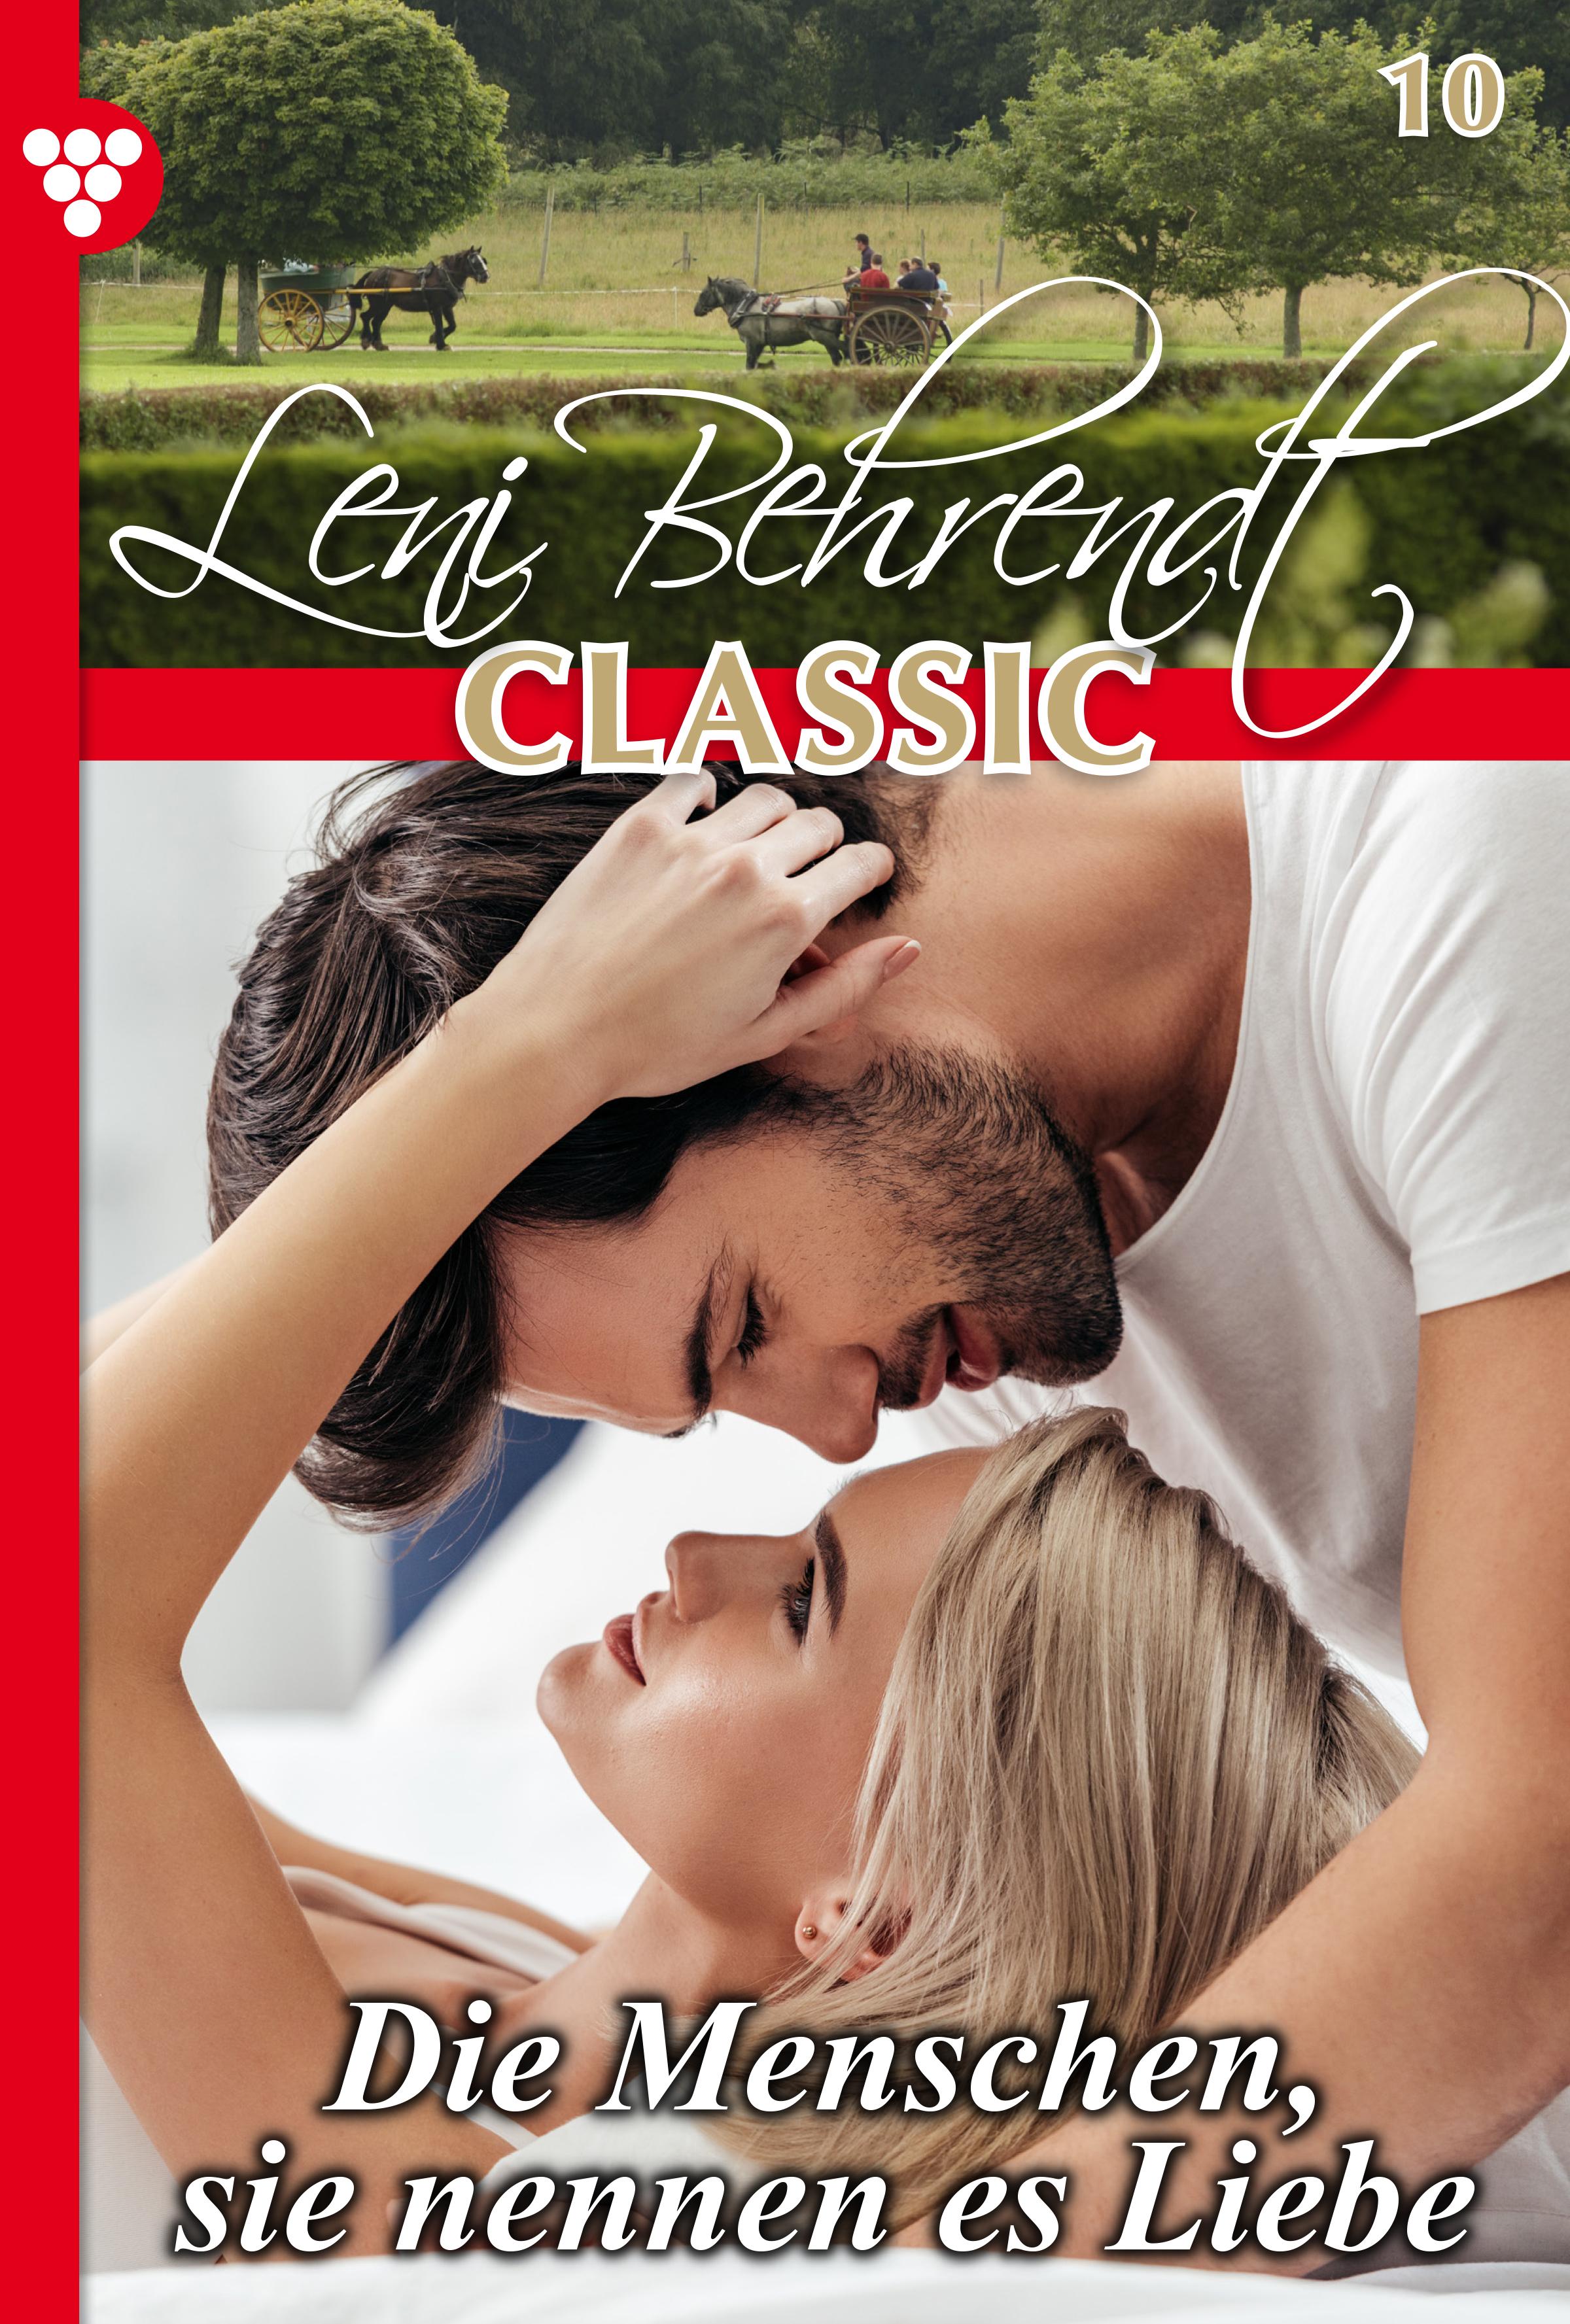 Фото - Leni Behrendt Leni Behrendt Classic 10 – Liebesroman leni behrendt leni behrendt staffel 2 – liebesroman